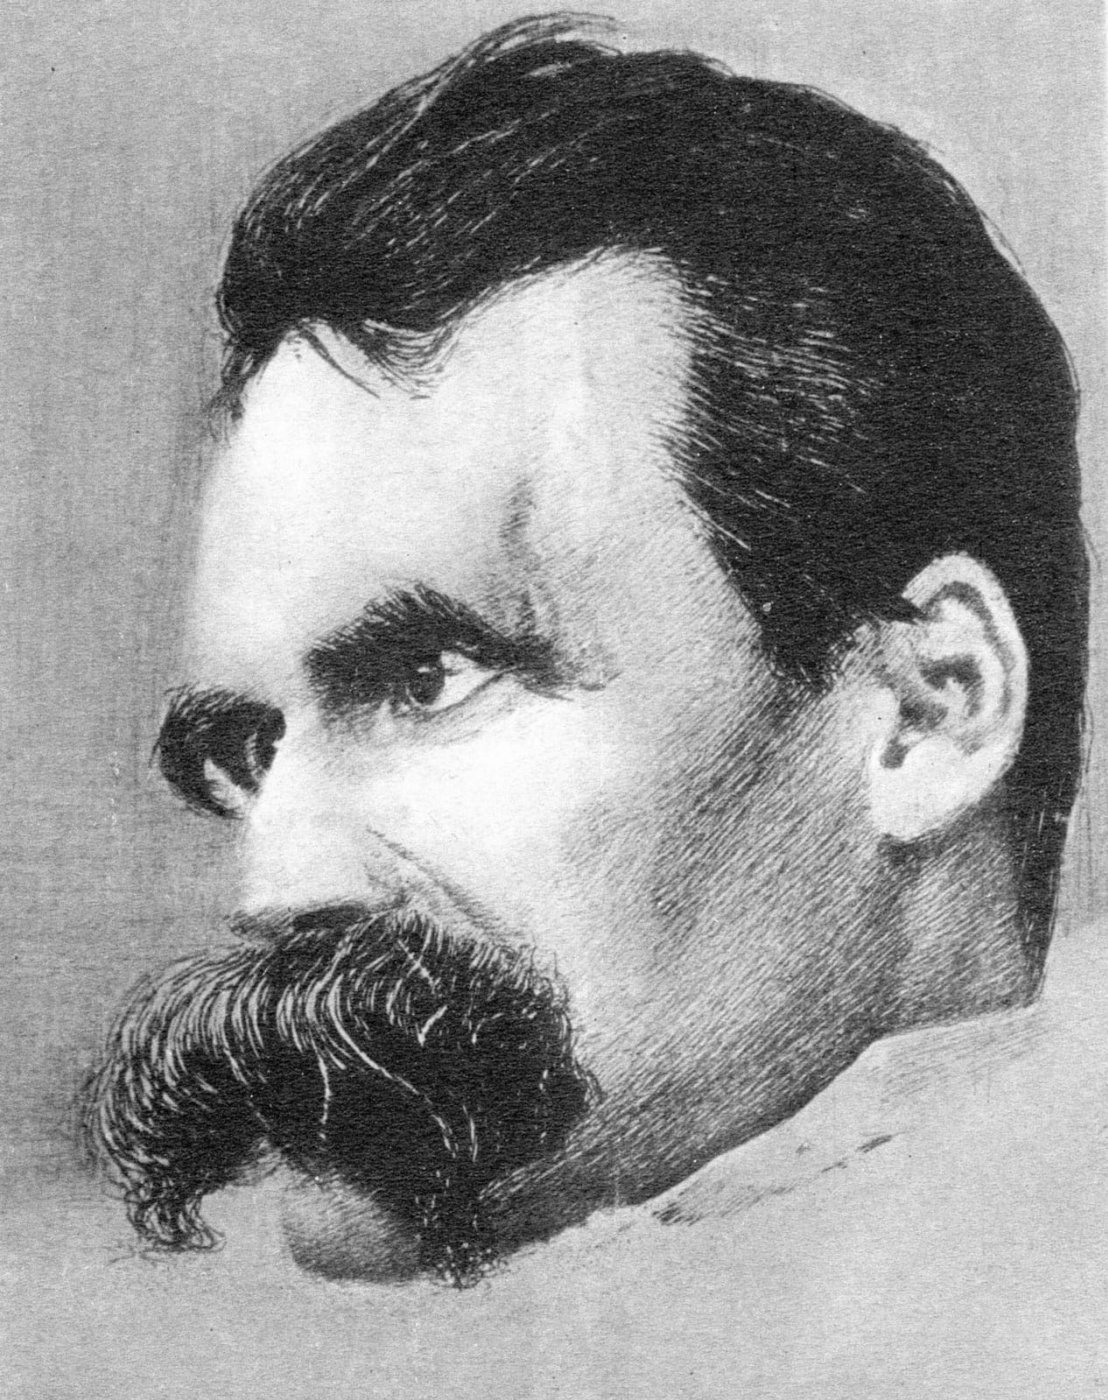 Louis Linda. Portrait of Friedrich Nietzsche by Linda Louis